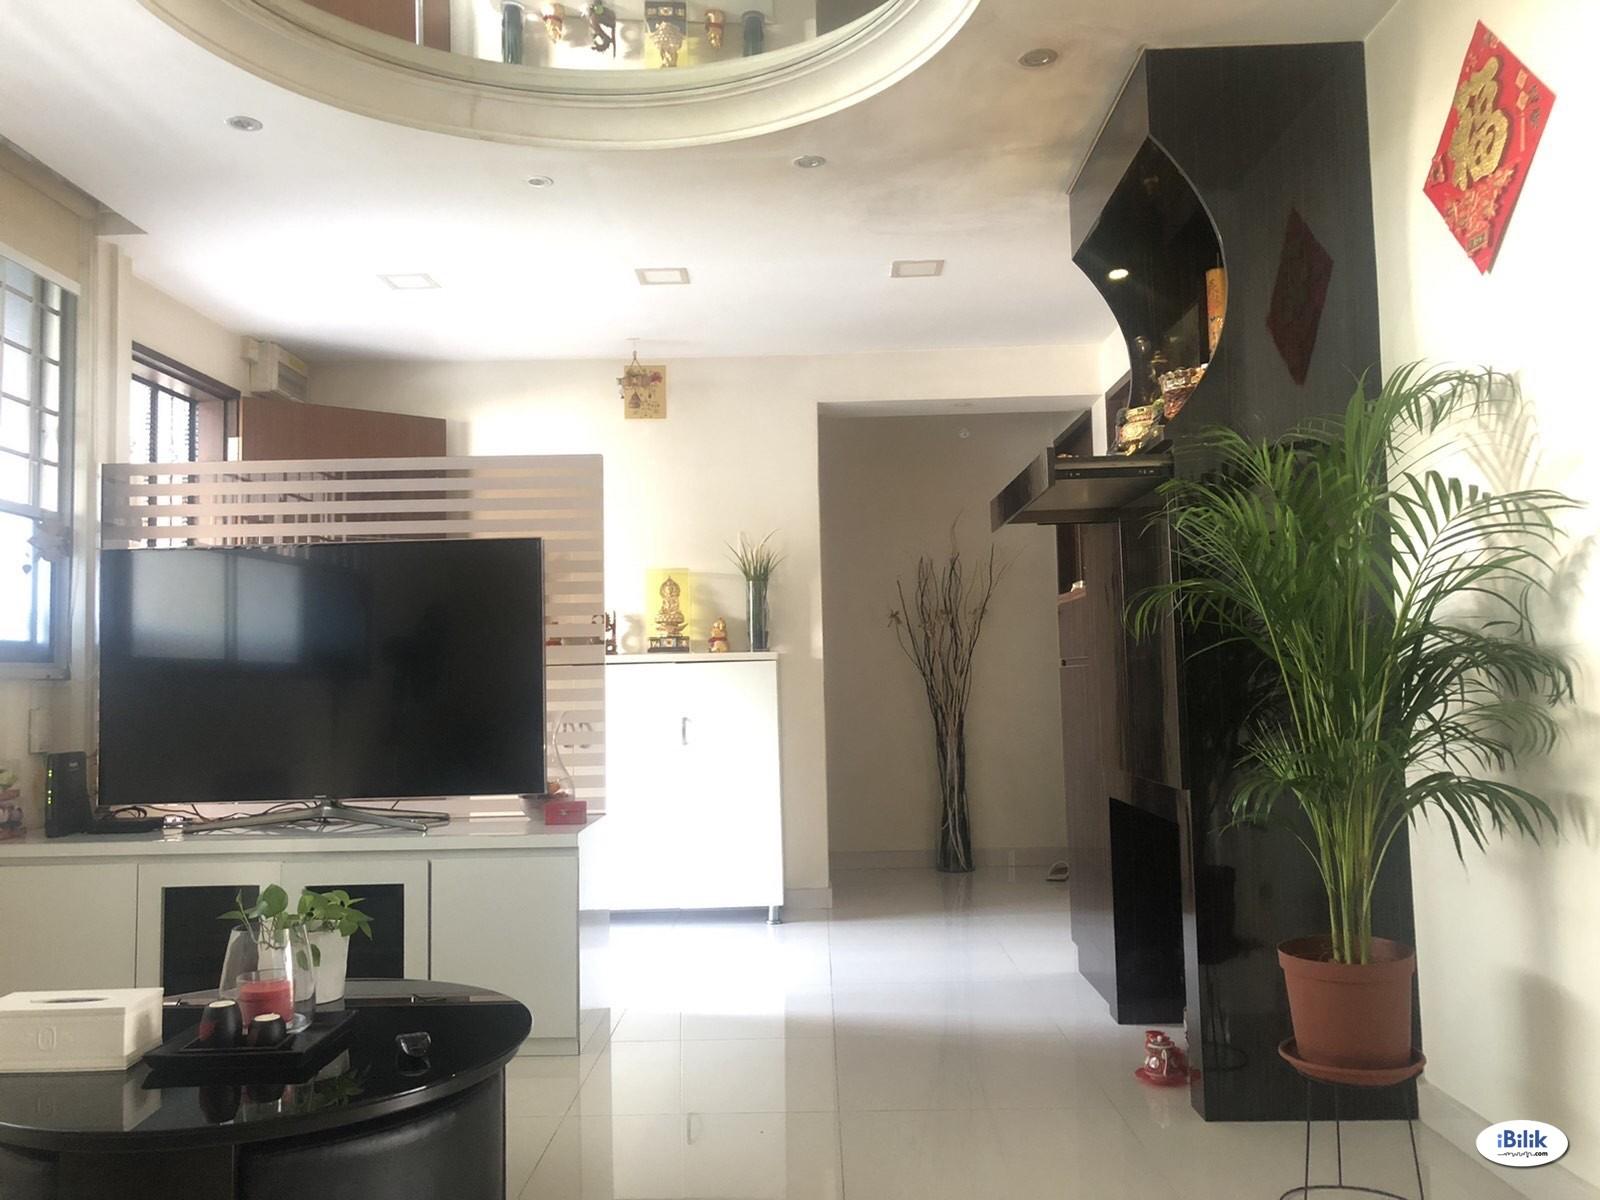 Middle Room at Yishun, Singapore